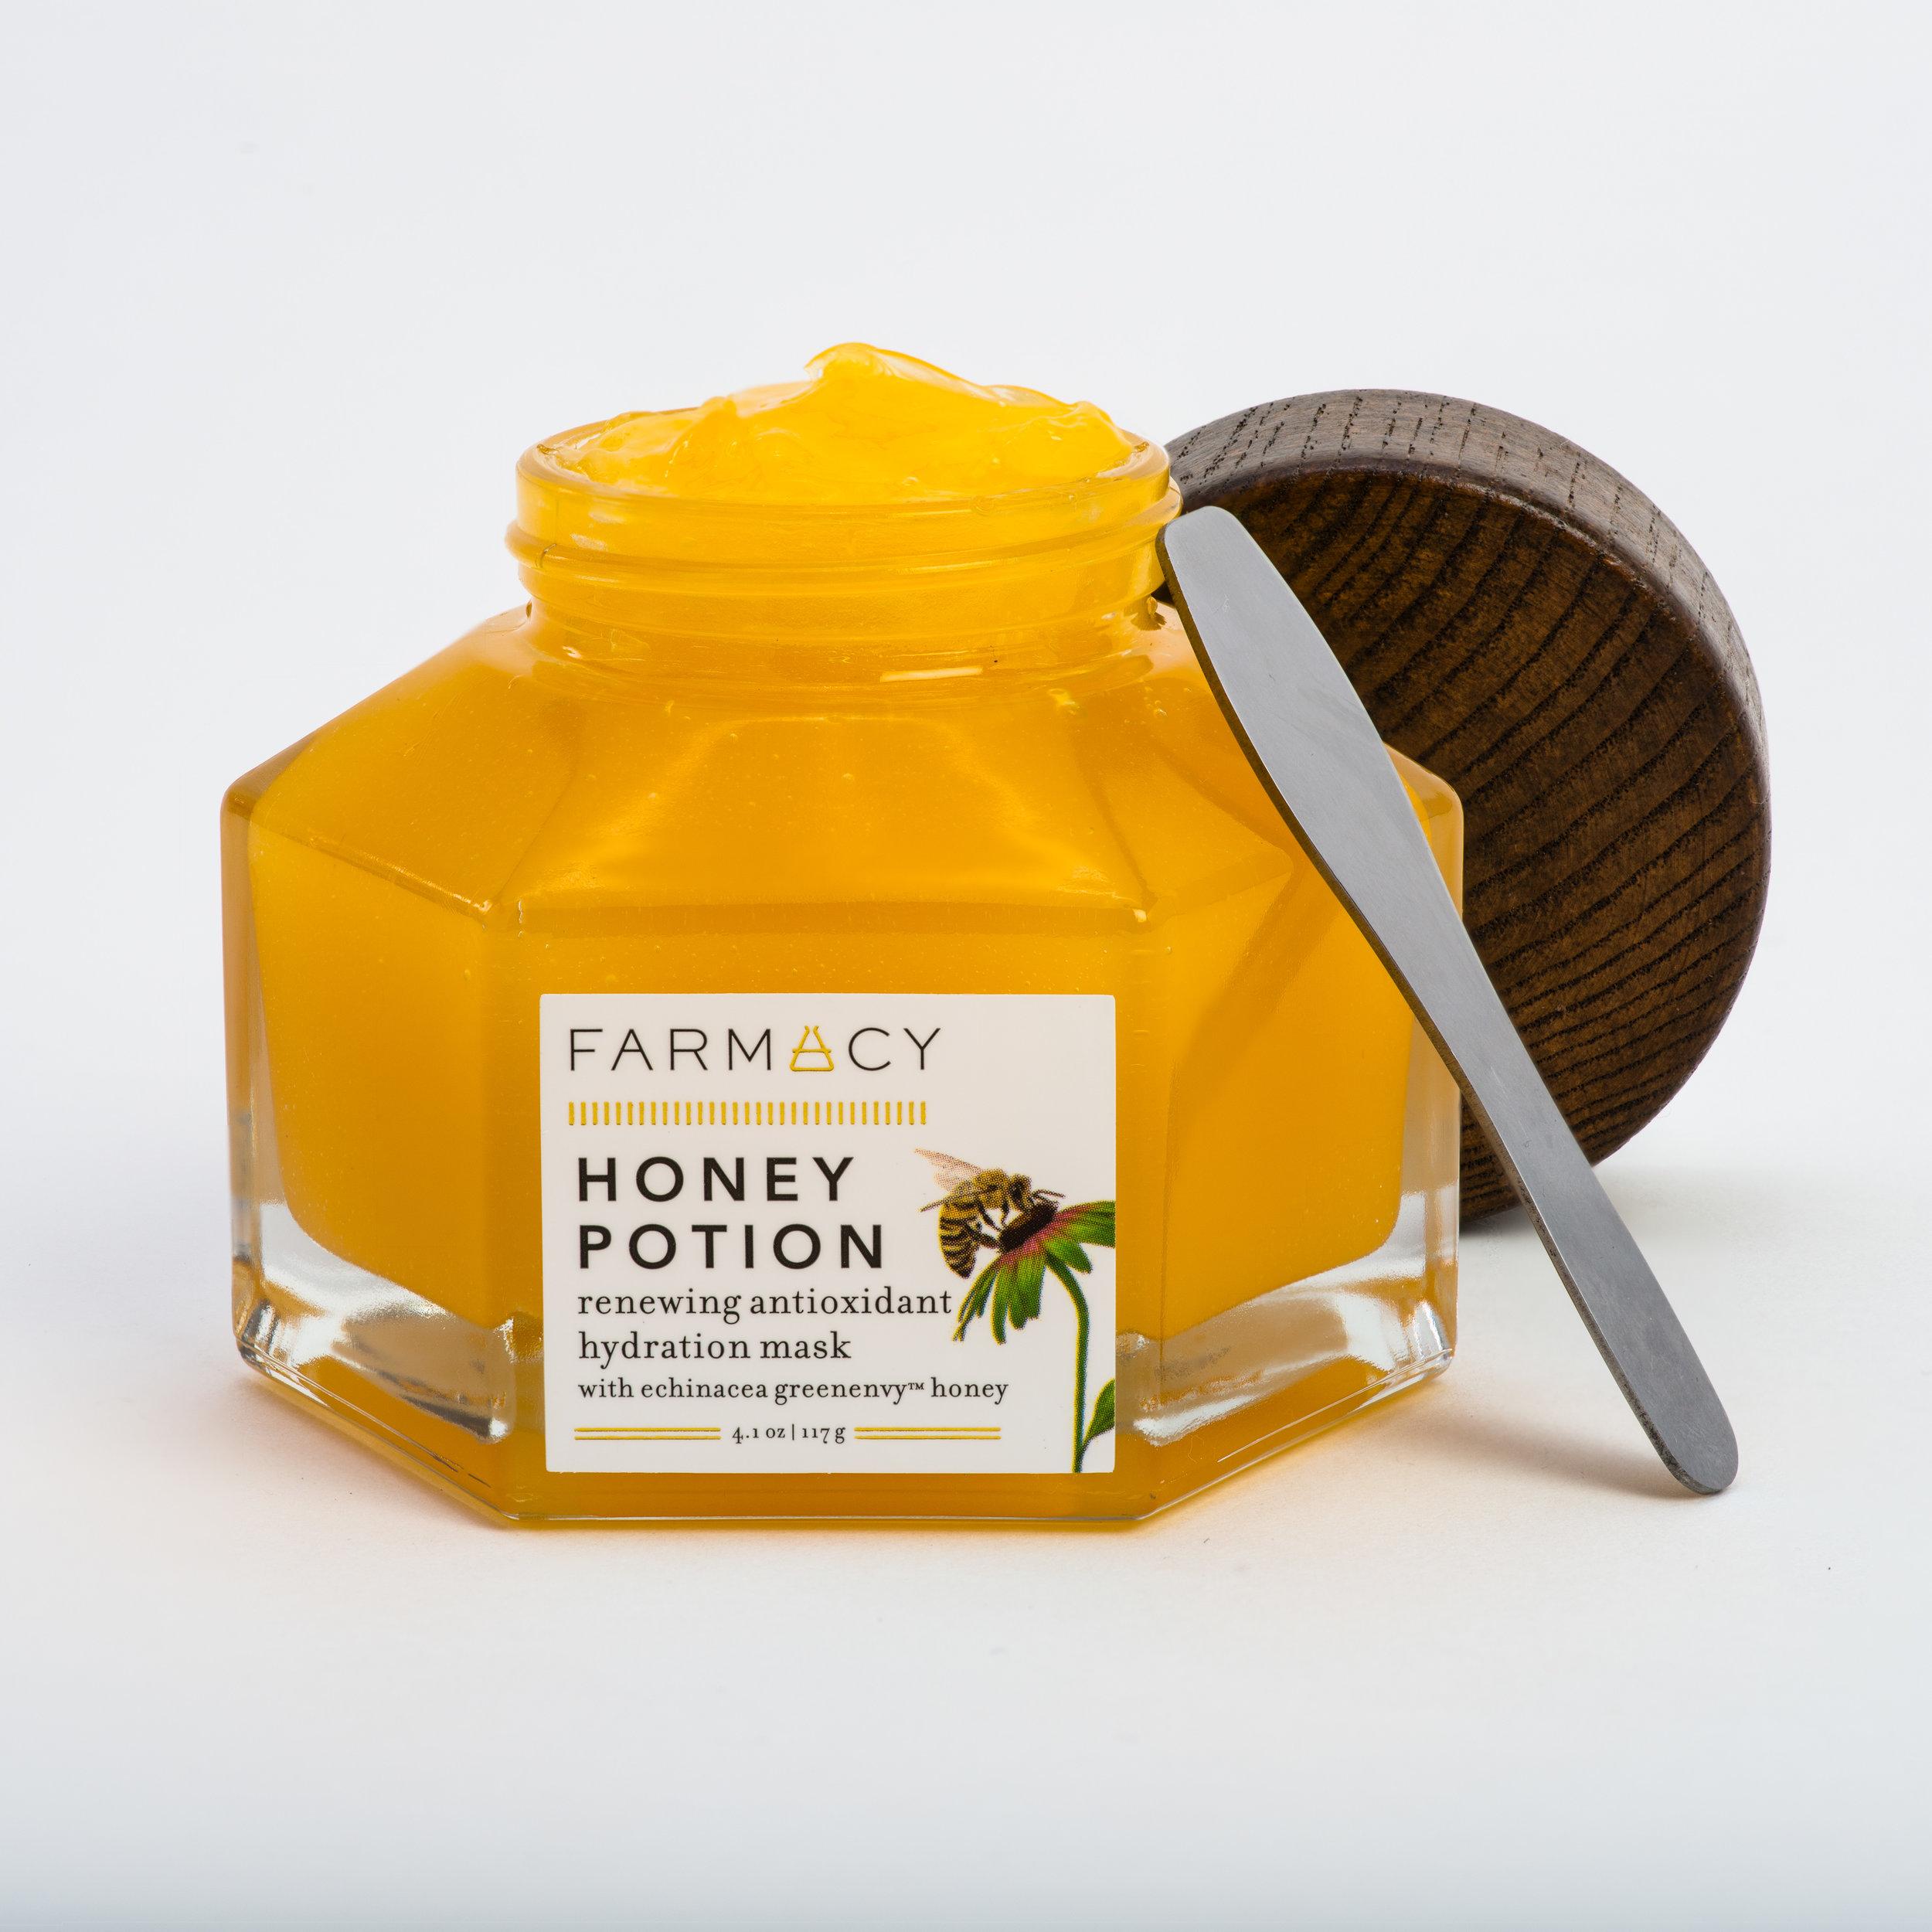 Honey Potion Goop Alt 0126-Edit-Edit.jpg